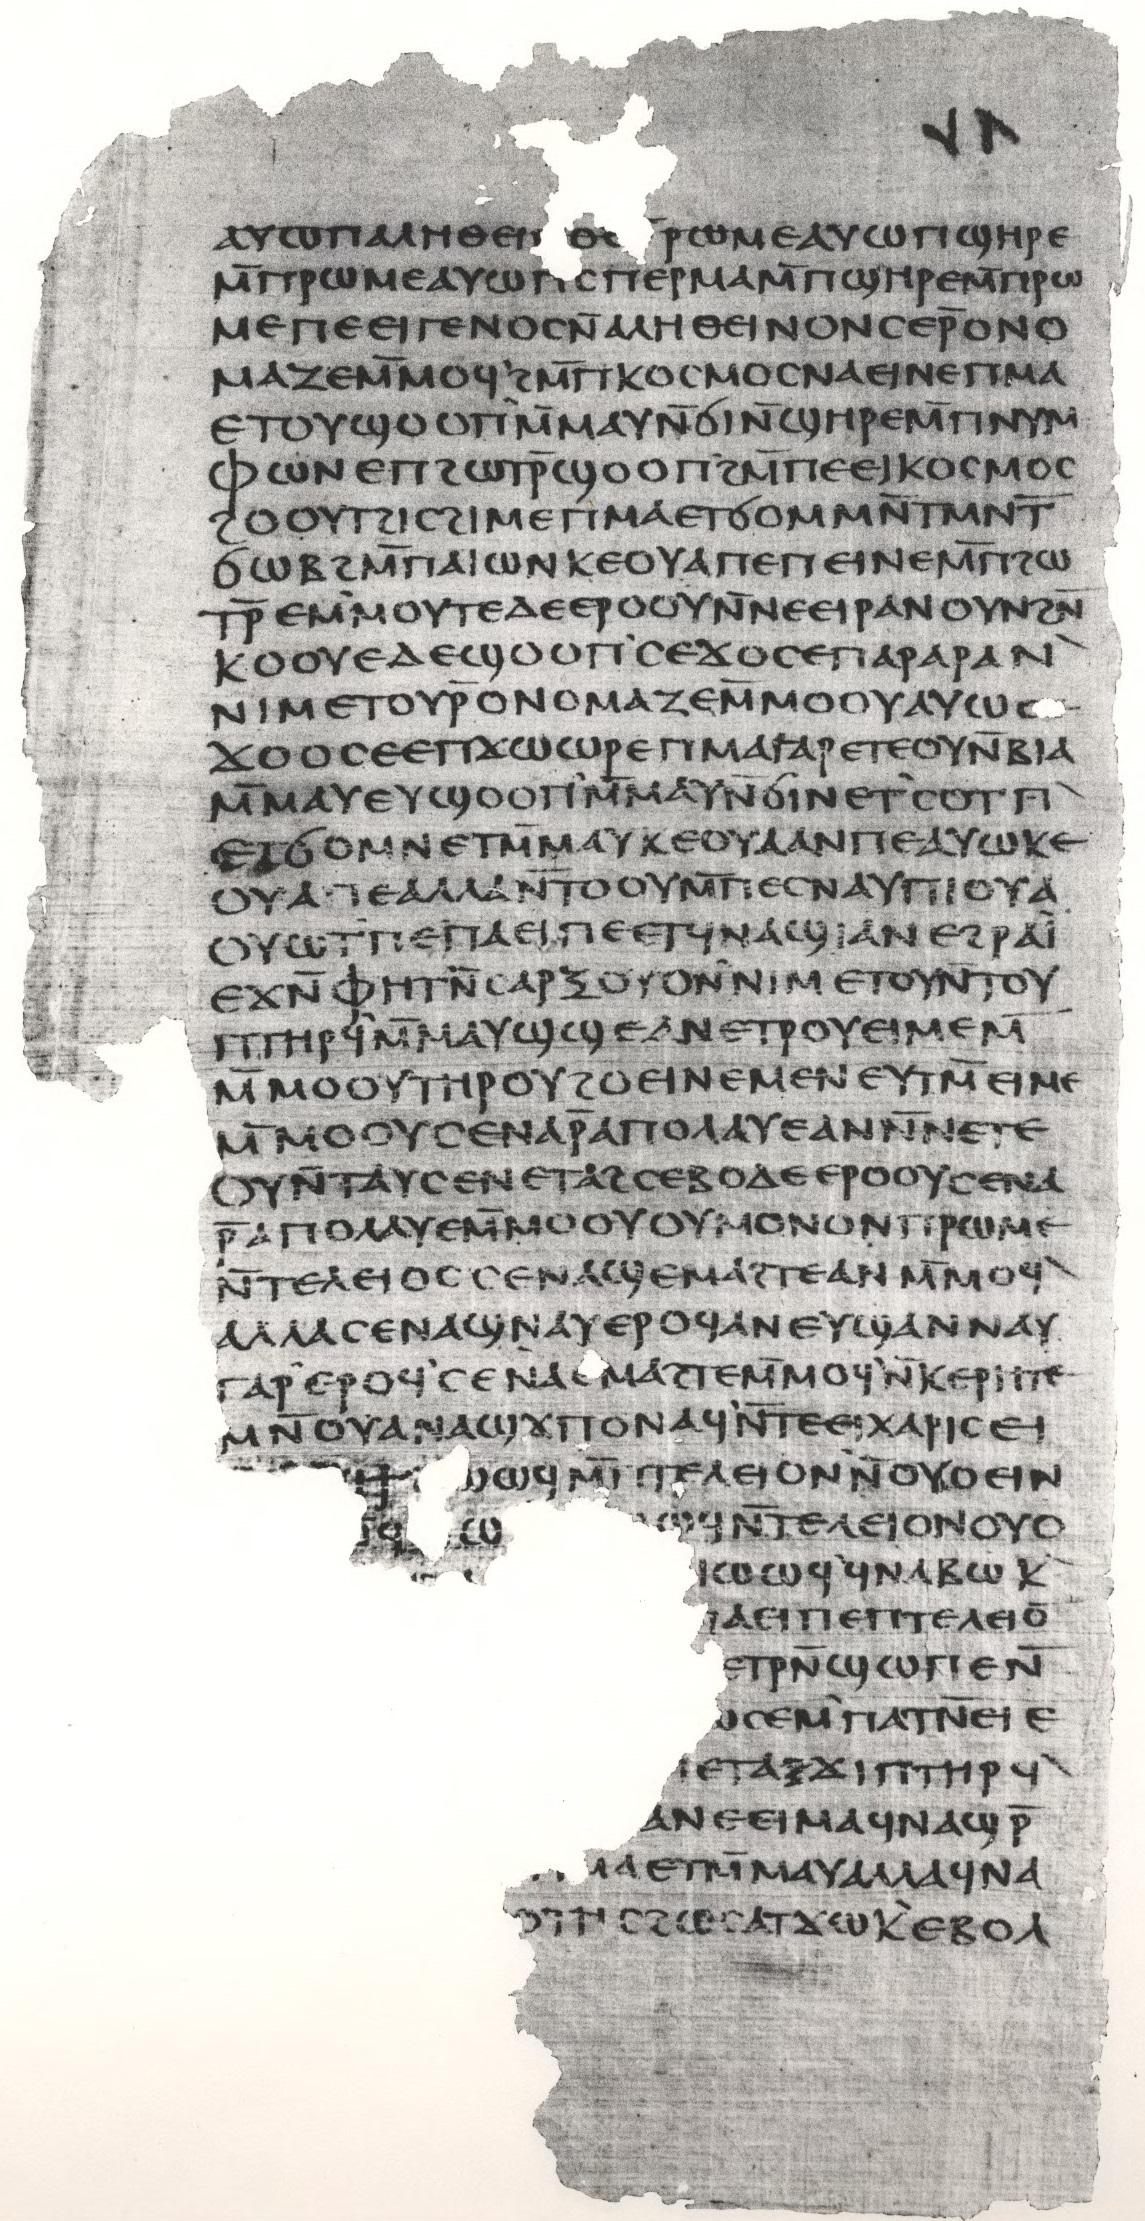 Gospel_of_Philip_facsimile_Page_76.jpg